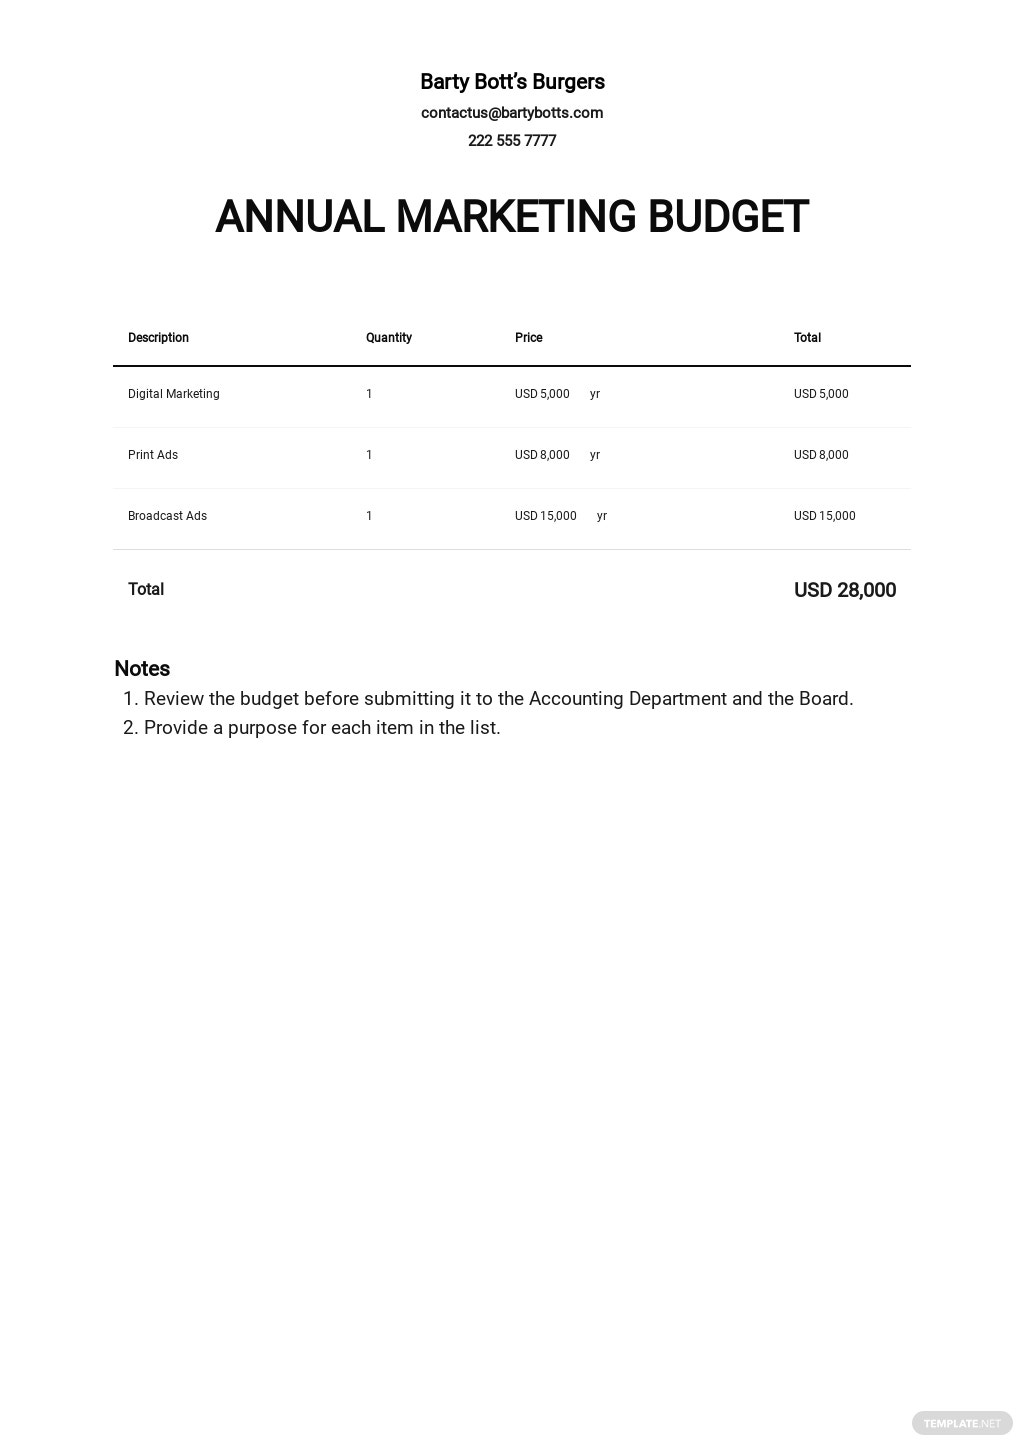 Annual Marketing Budget Template.jpe